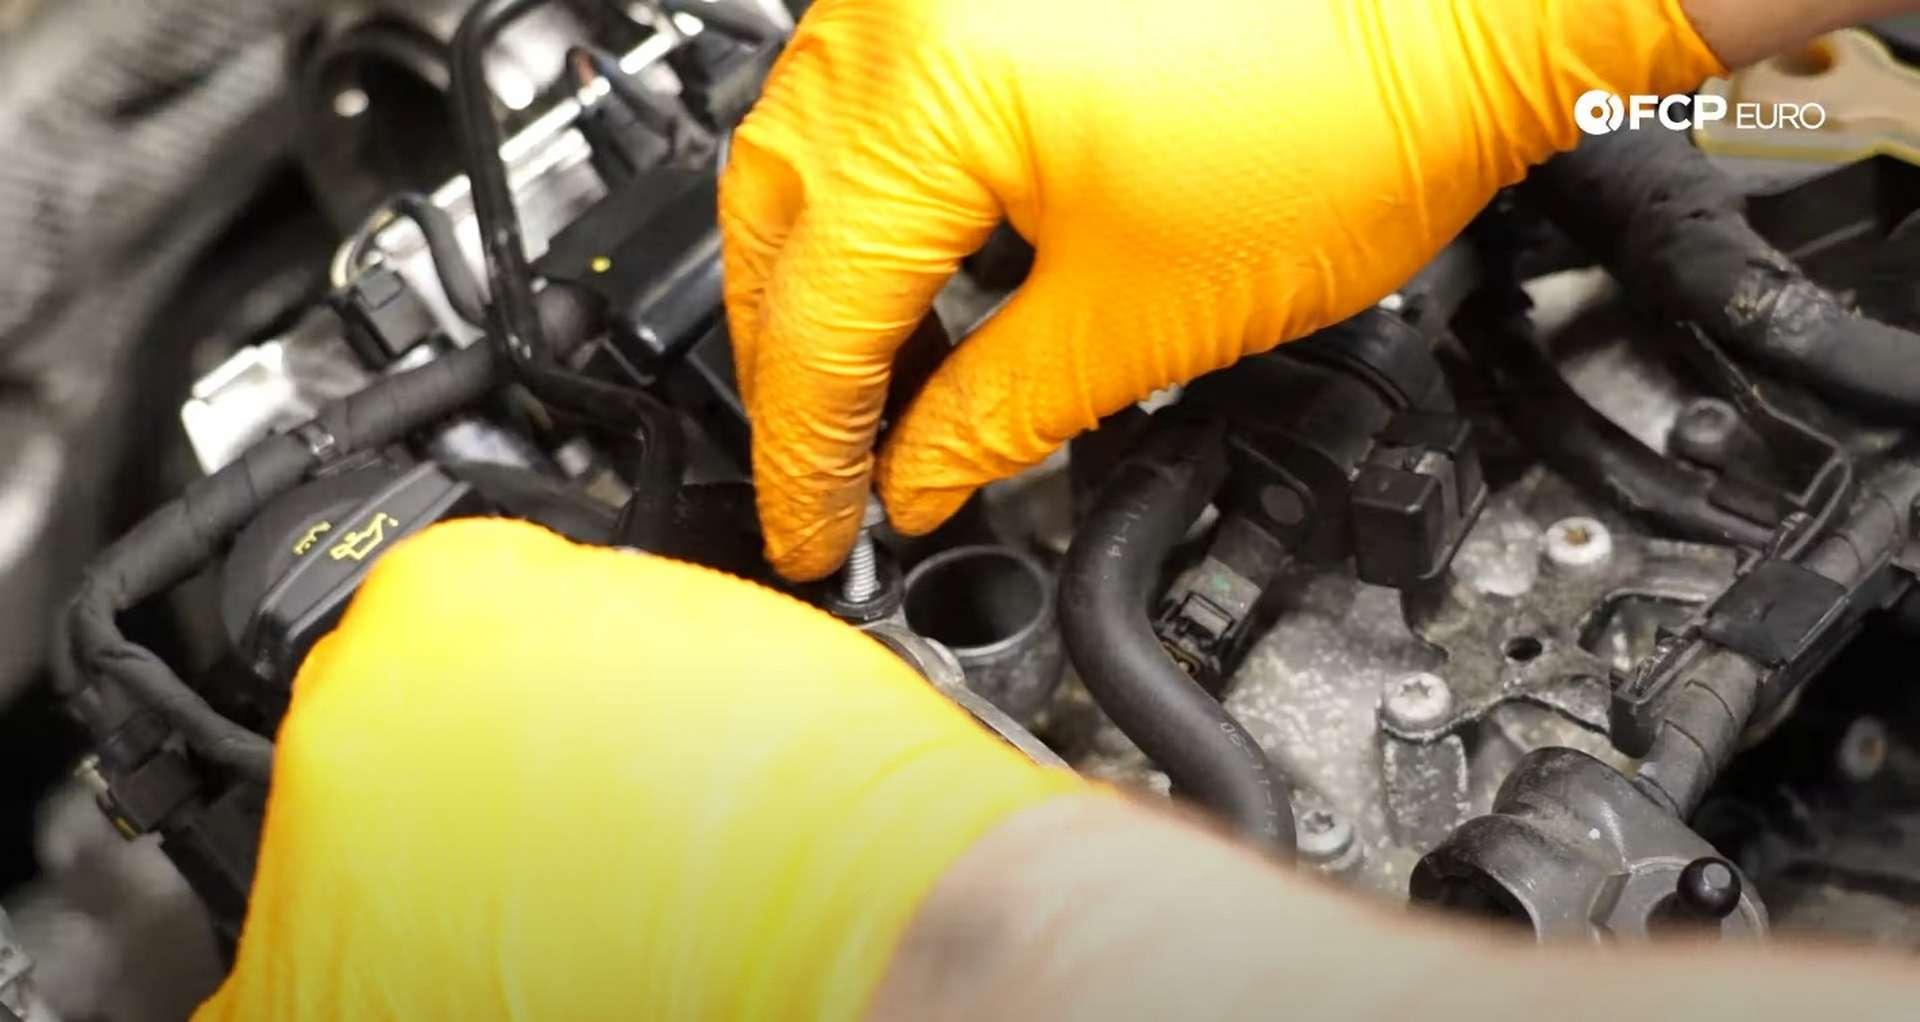 DIY MK7 VW GTI Turbocharger Upgrade coolant line bolt location